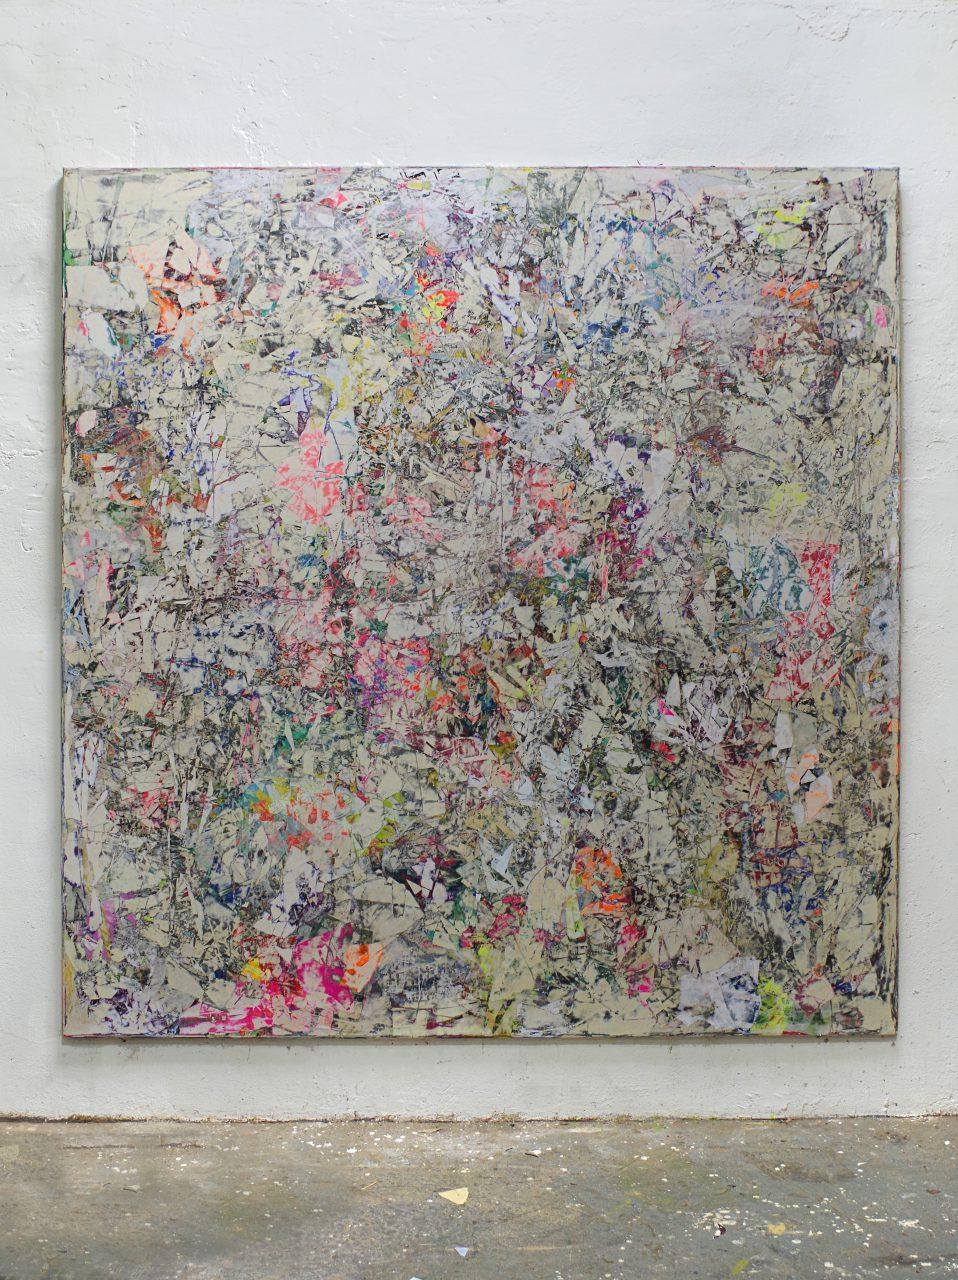 2018, Acryl, Spraypaint, Papier, Leinwand, Keilrahmen 240 x 220 cm